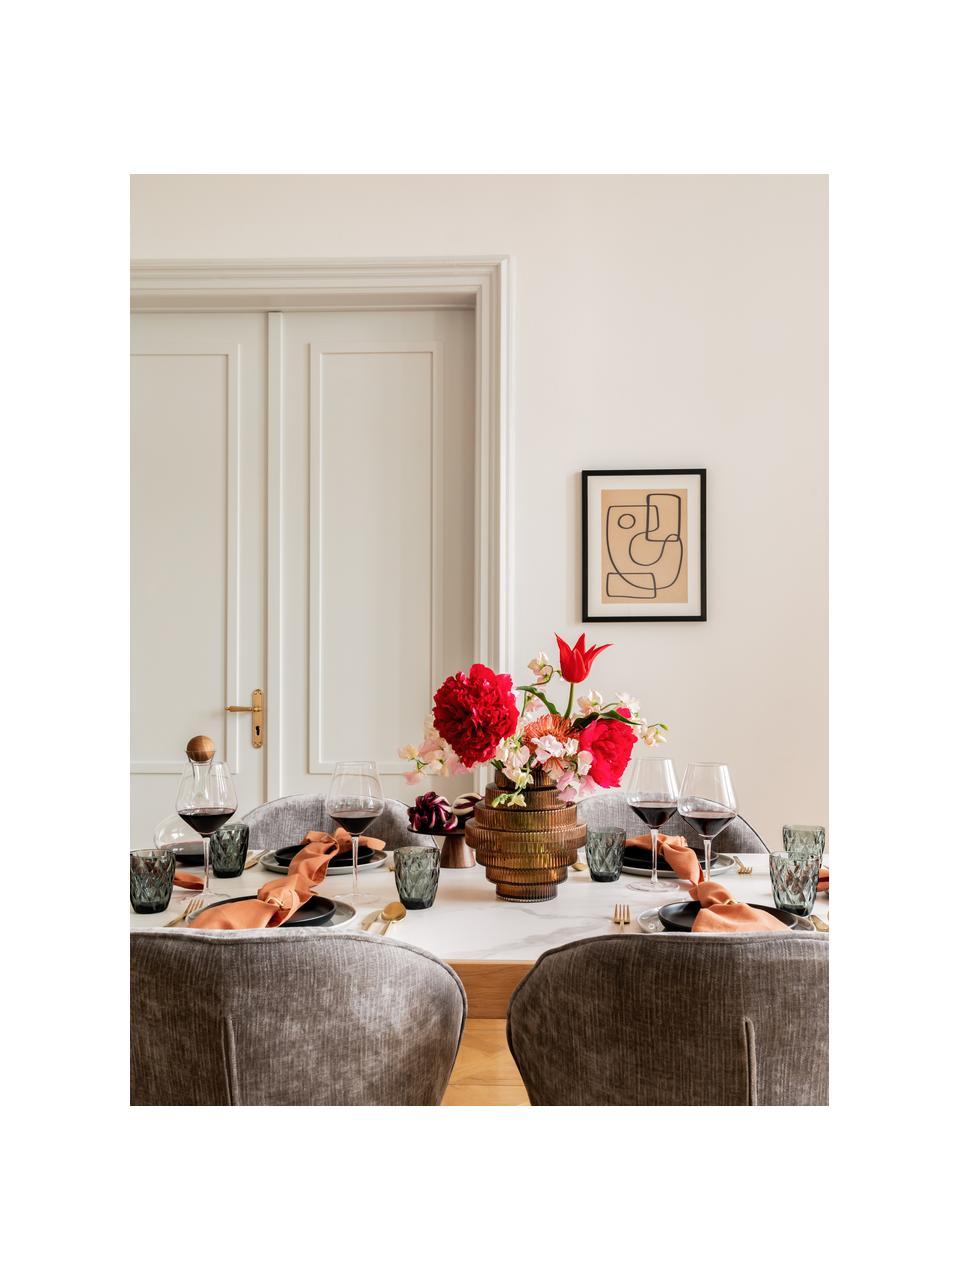 Bicchiere vino rosso in vetro soffiato Ays 4 pz, Vetro, Trasparente, Ø 7 x Alt. 25 cm